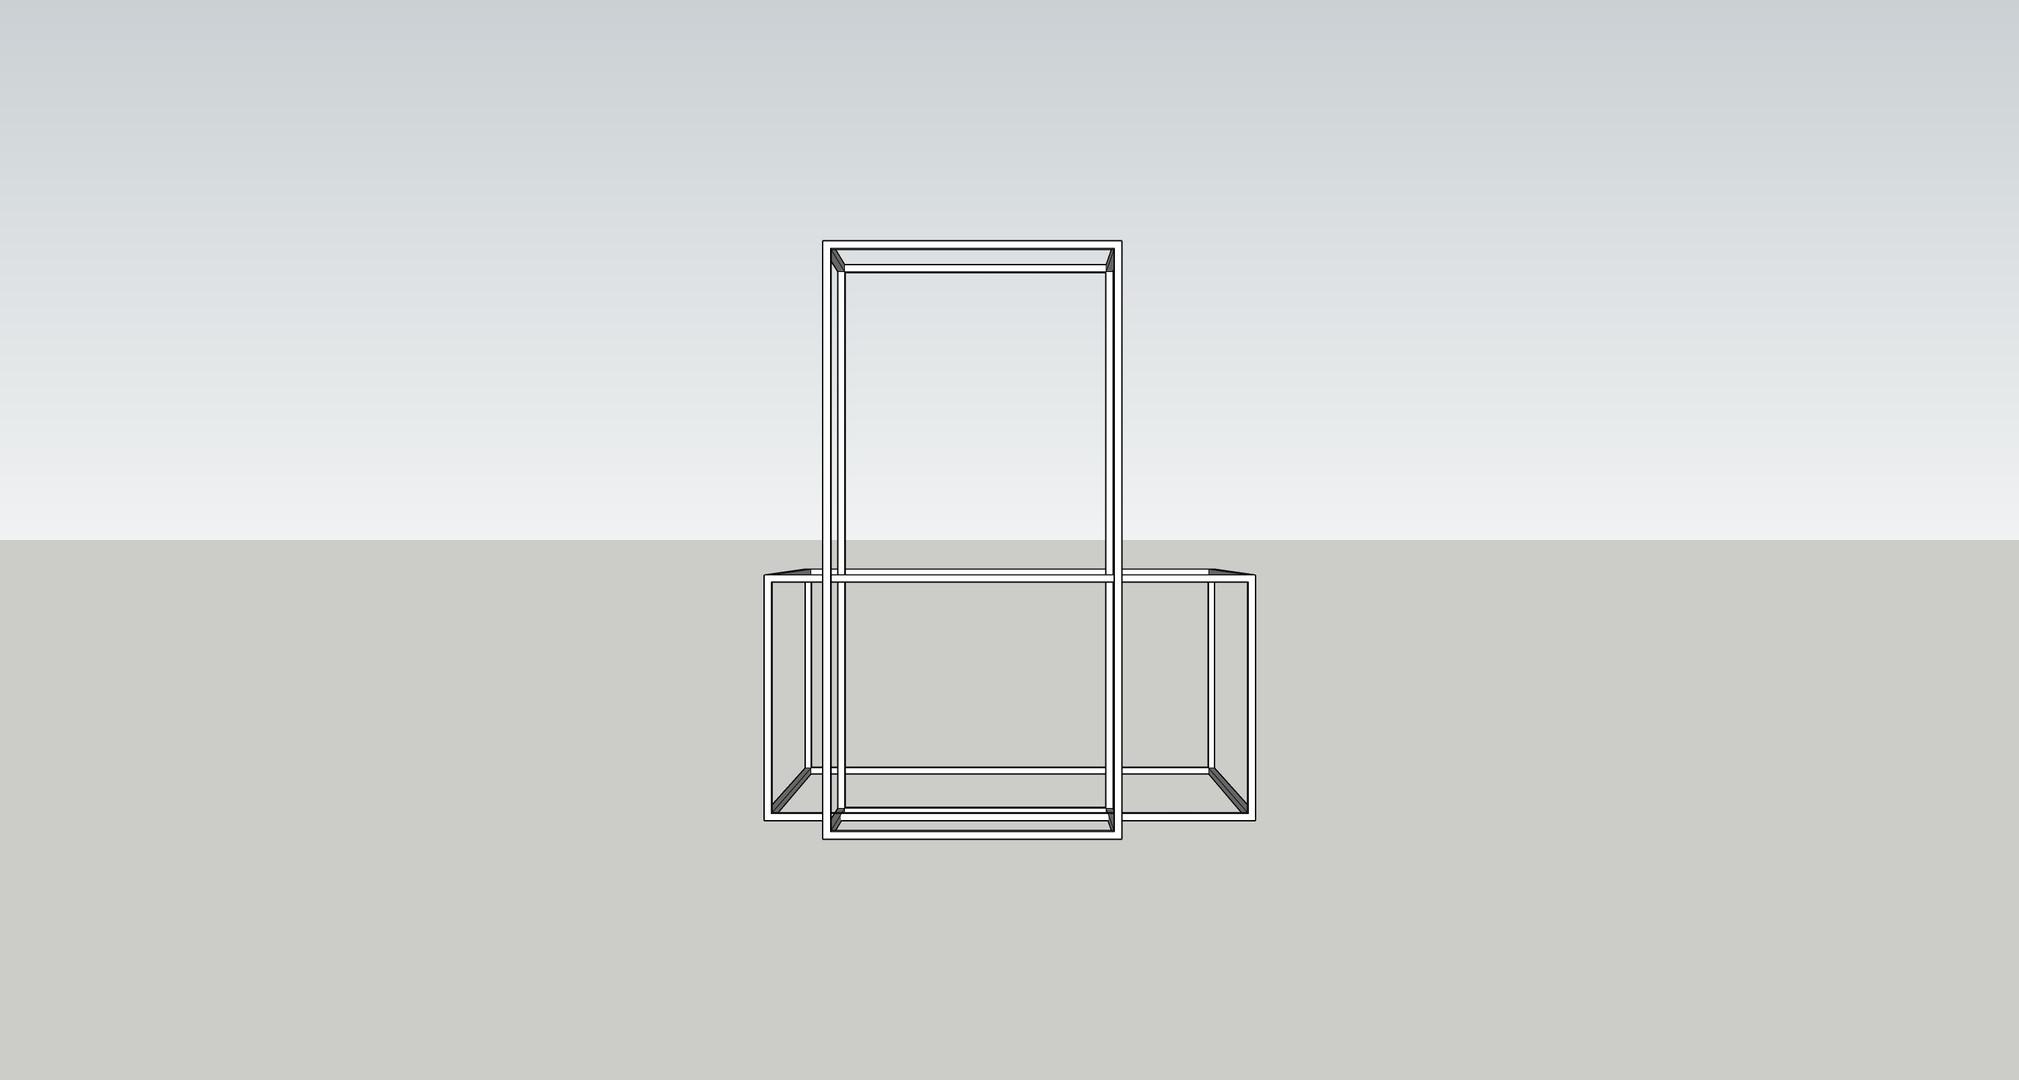 Final piece_perspective 4.jpg